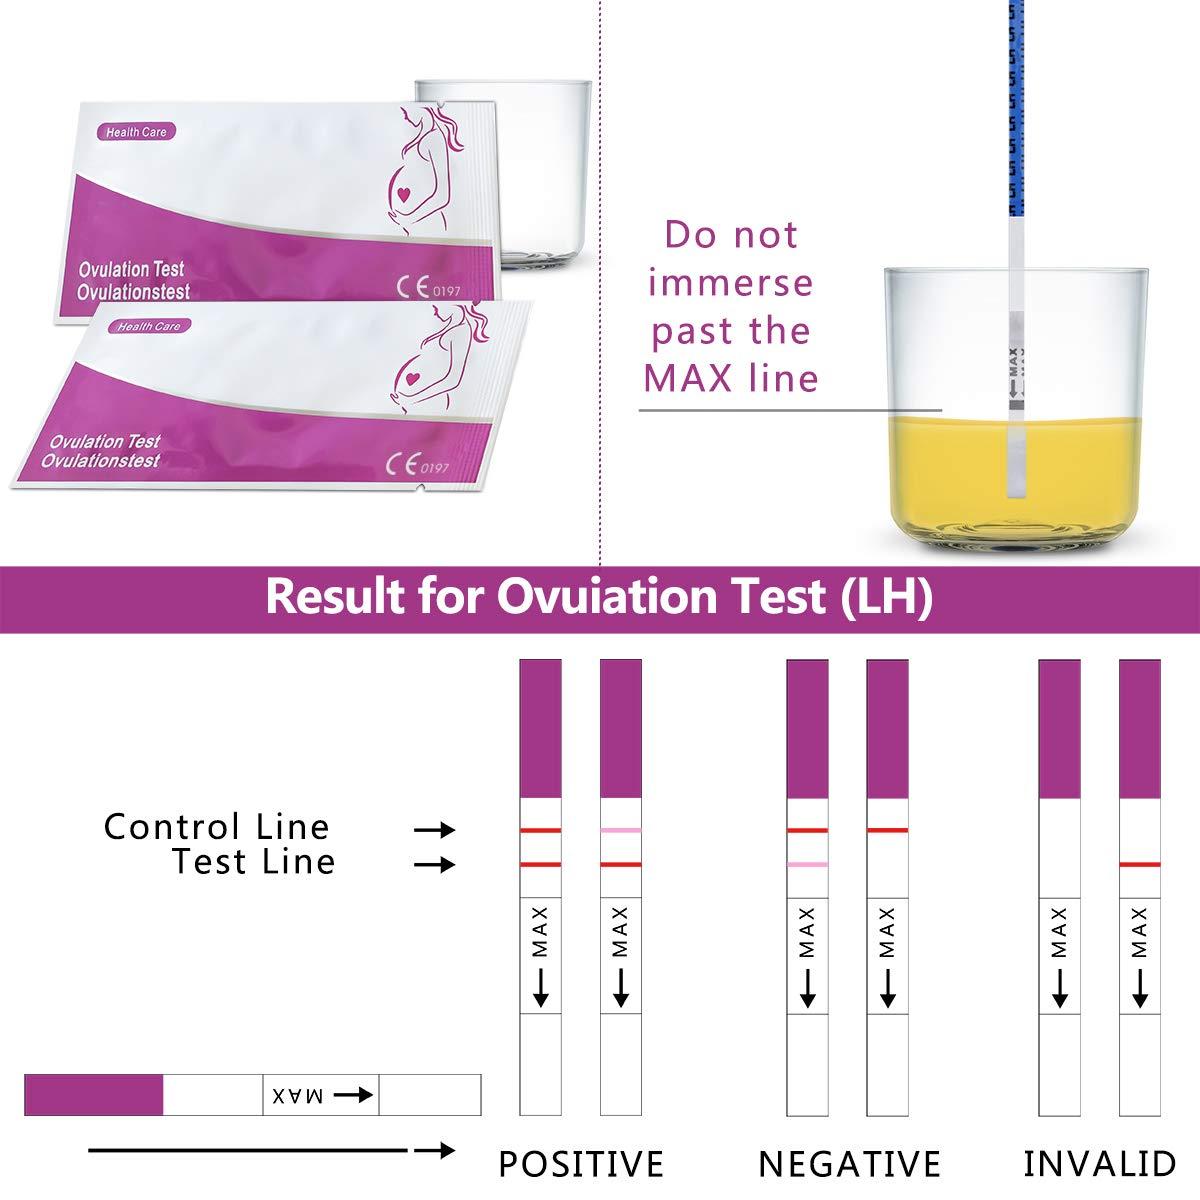 Ovulation Test Kit, 50 (LH) Ovulation Tests and 20 (HCG) Pregnancy Test  Strips Kit - Ovulation Predictor Kits (50 LH + 20 HCG Tests)